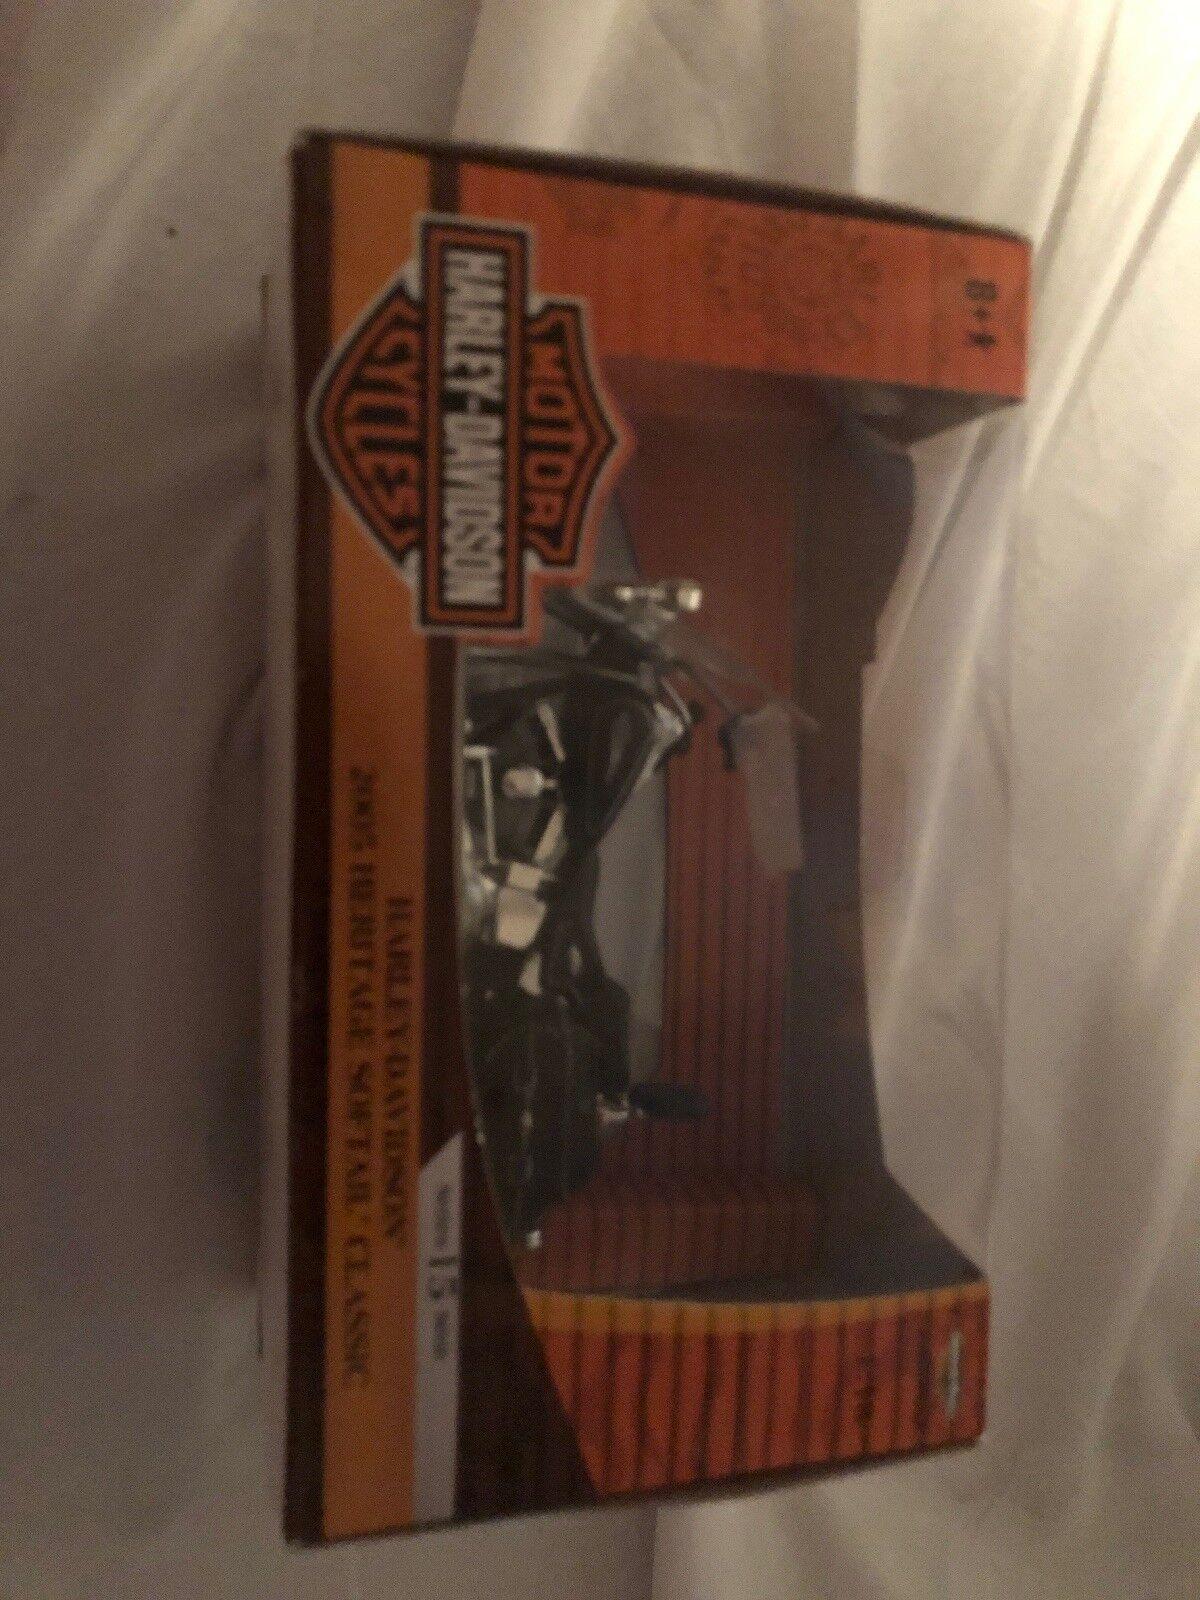 2005 Harley Davidson Patrimonio Softail 1 18, Negro, menta en caja